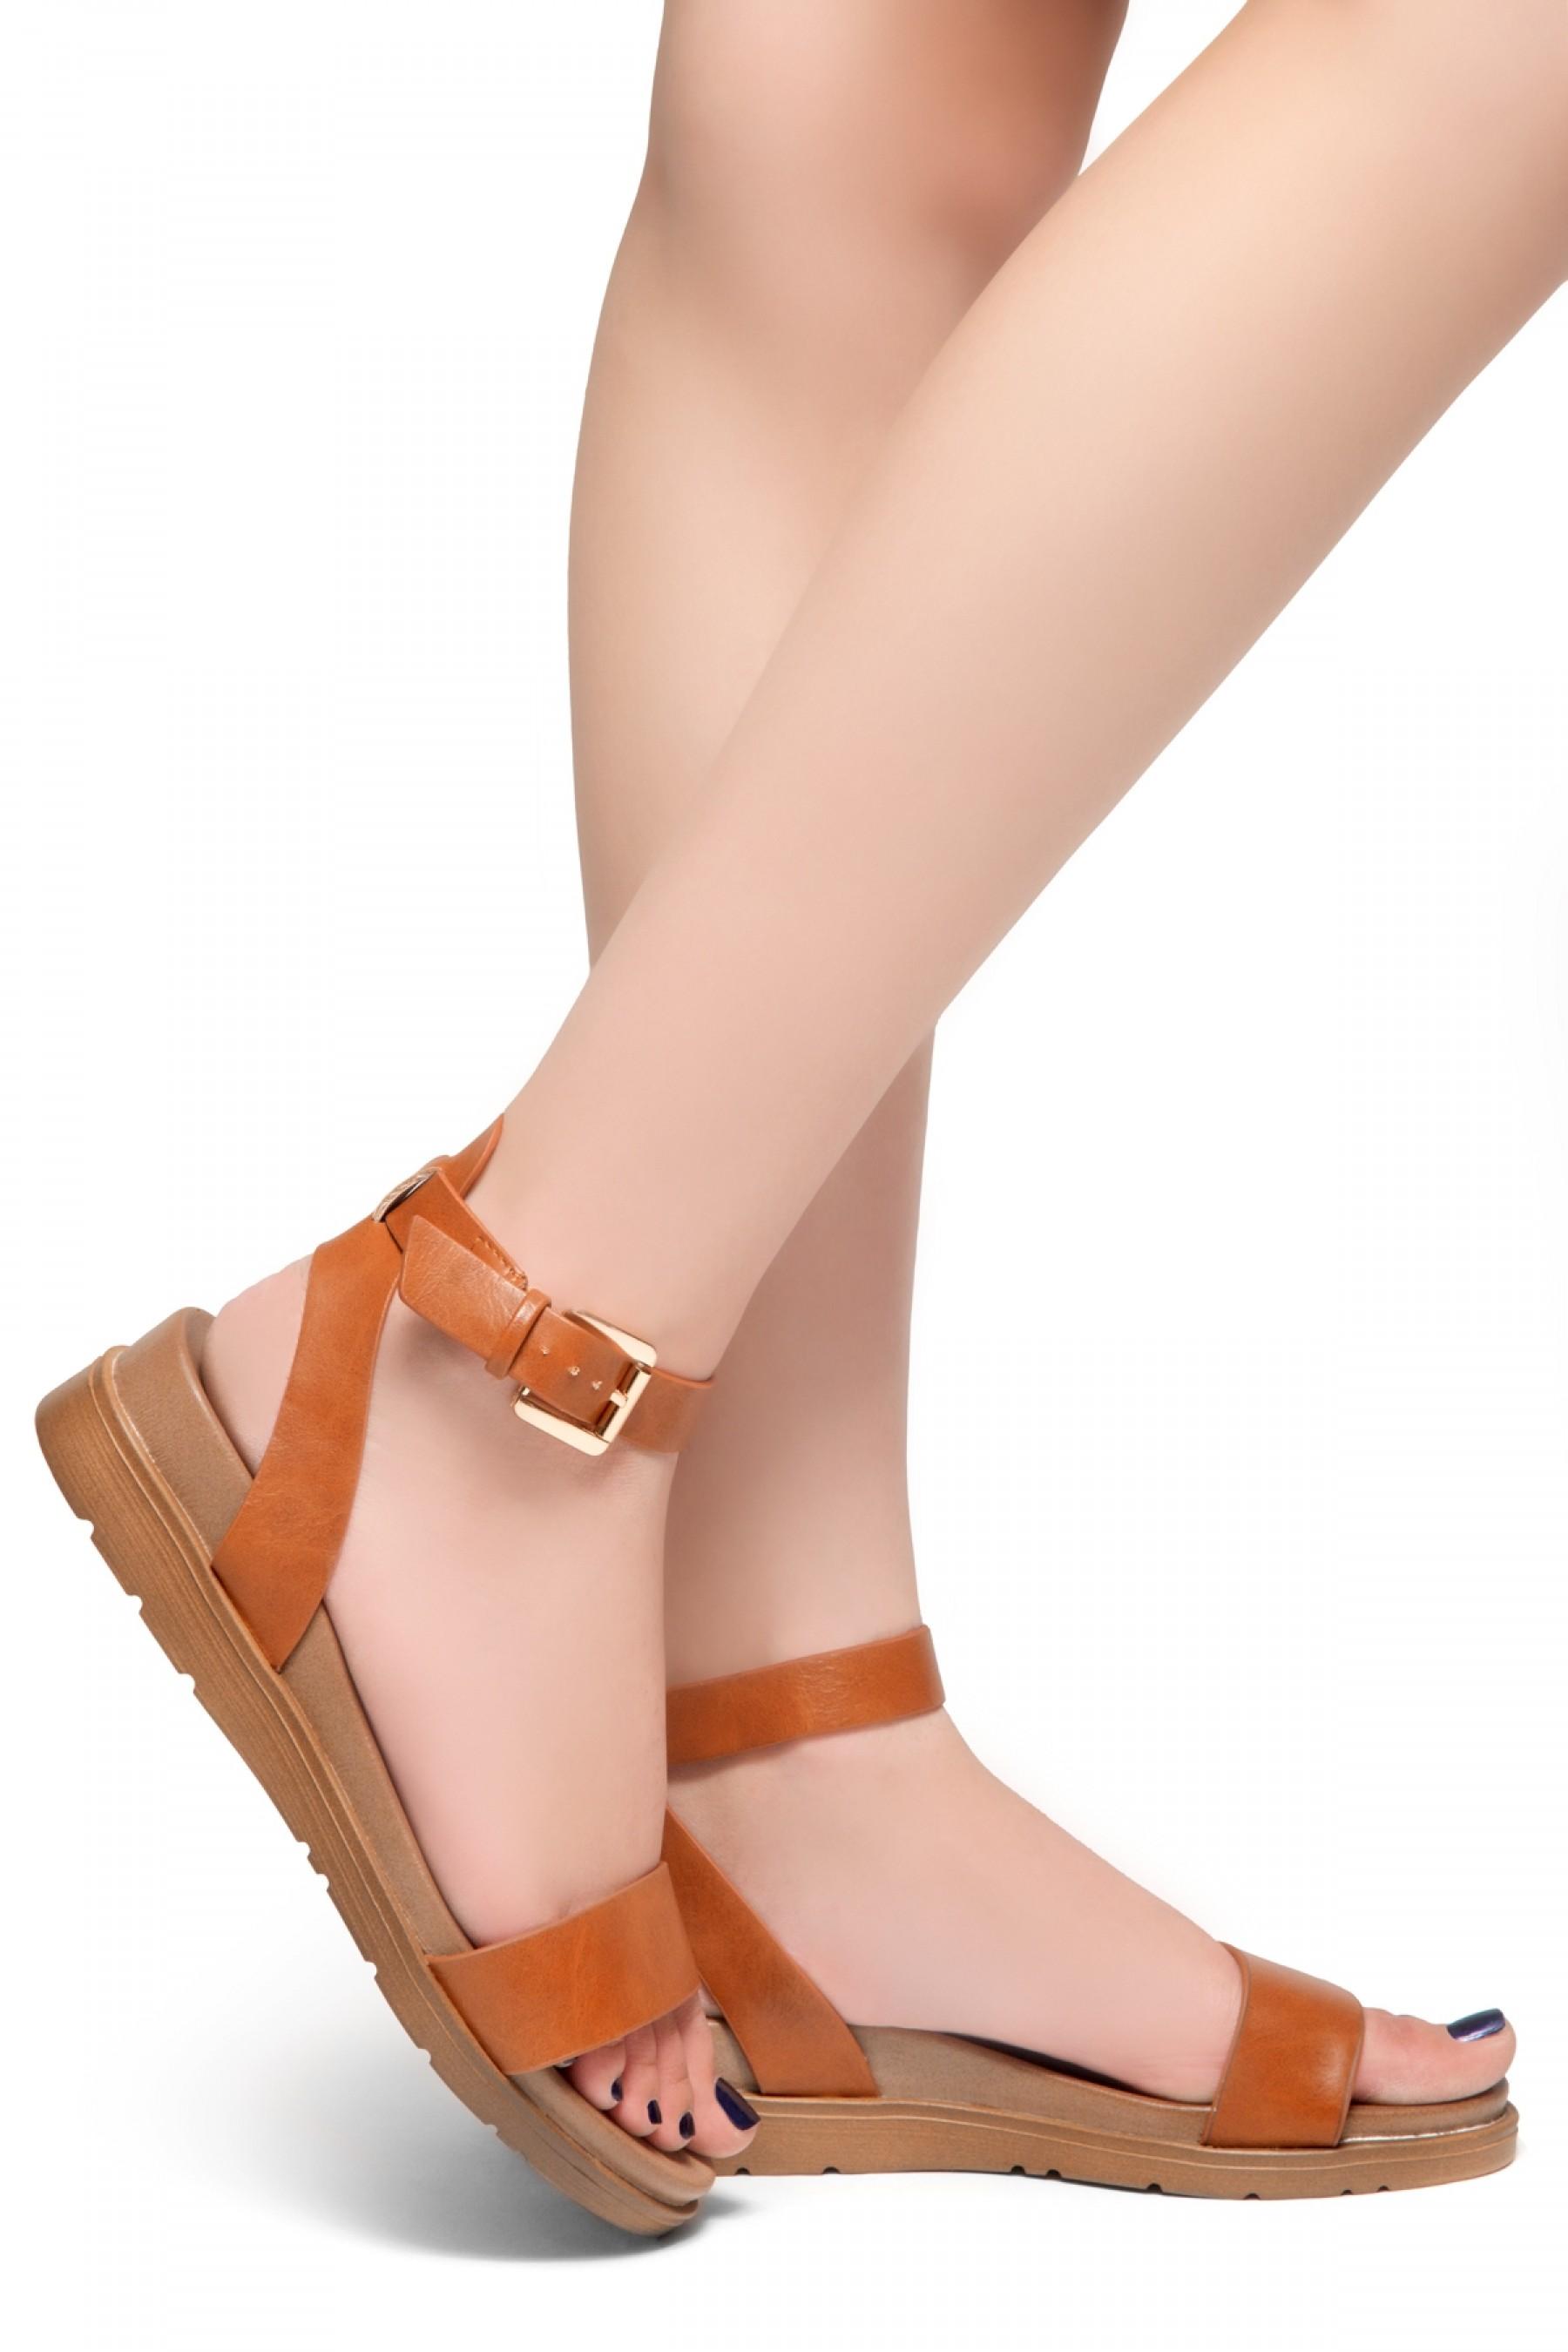 HerStyle Needed Me- Ankle Strap Flat Platform Sandal (Tan)